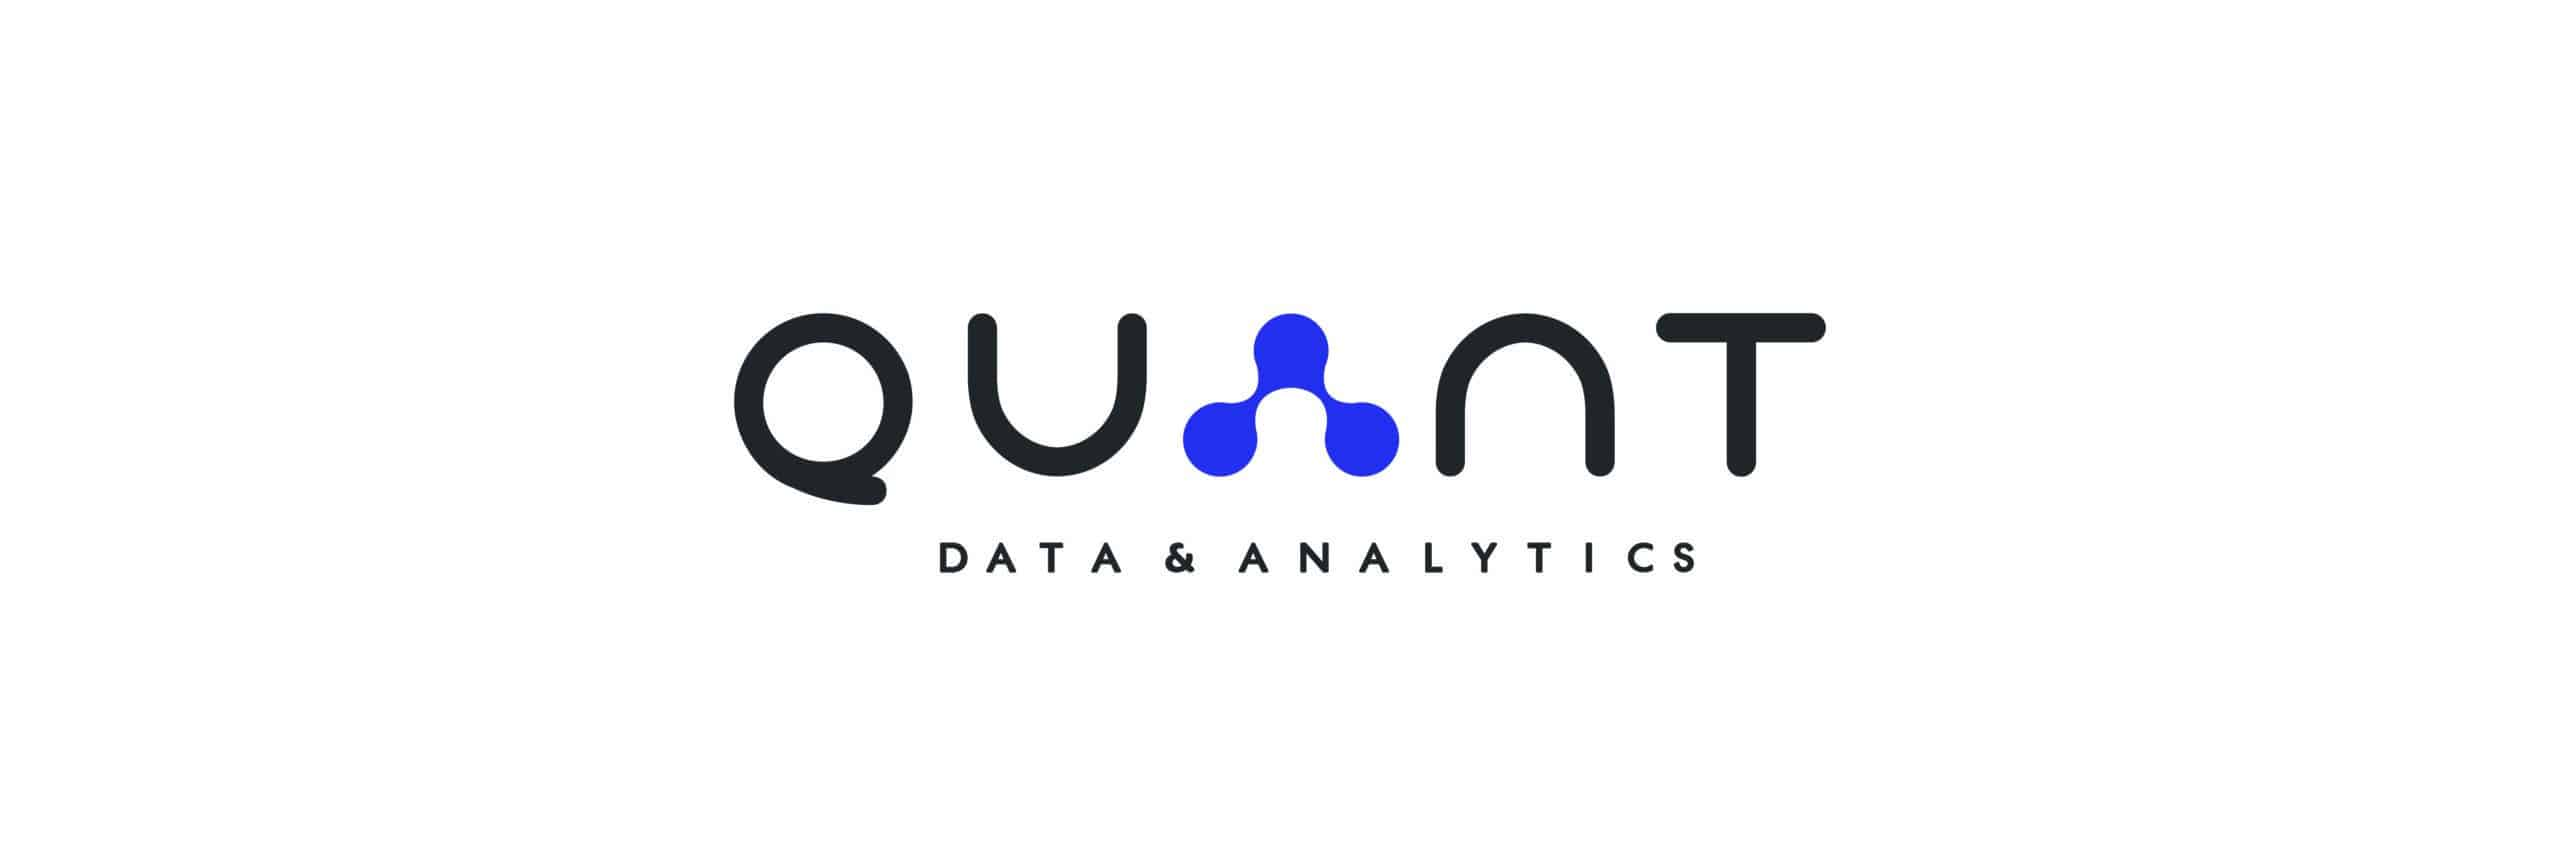 Data Science Company, Quant Raises $1.2 Million Pre-Series A Round